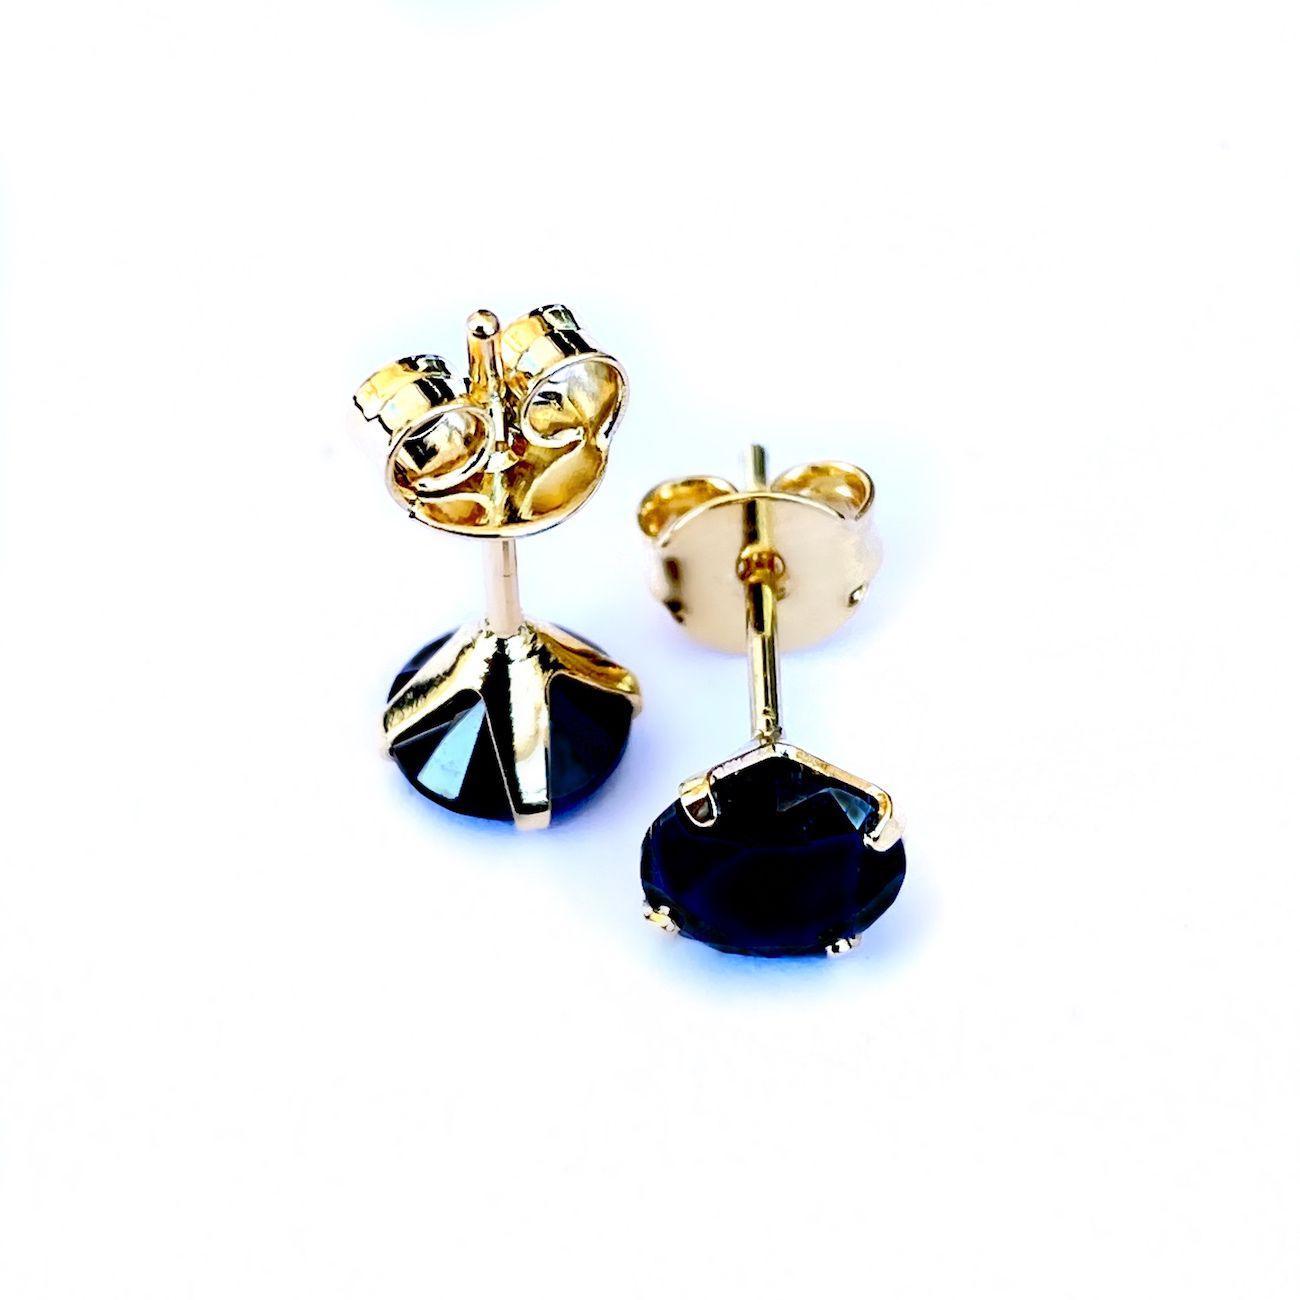 Brinco Pedra Preta de Zircônia Circular 6mm X 6mm (Banho De Ouro 18k).